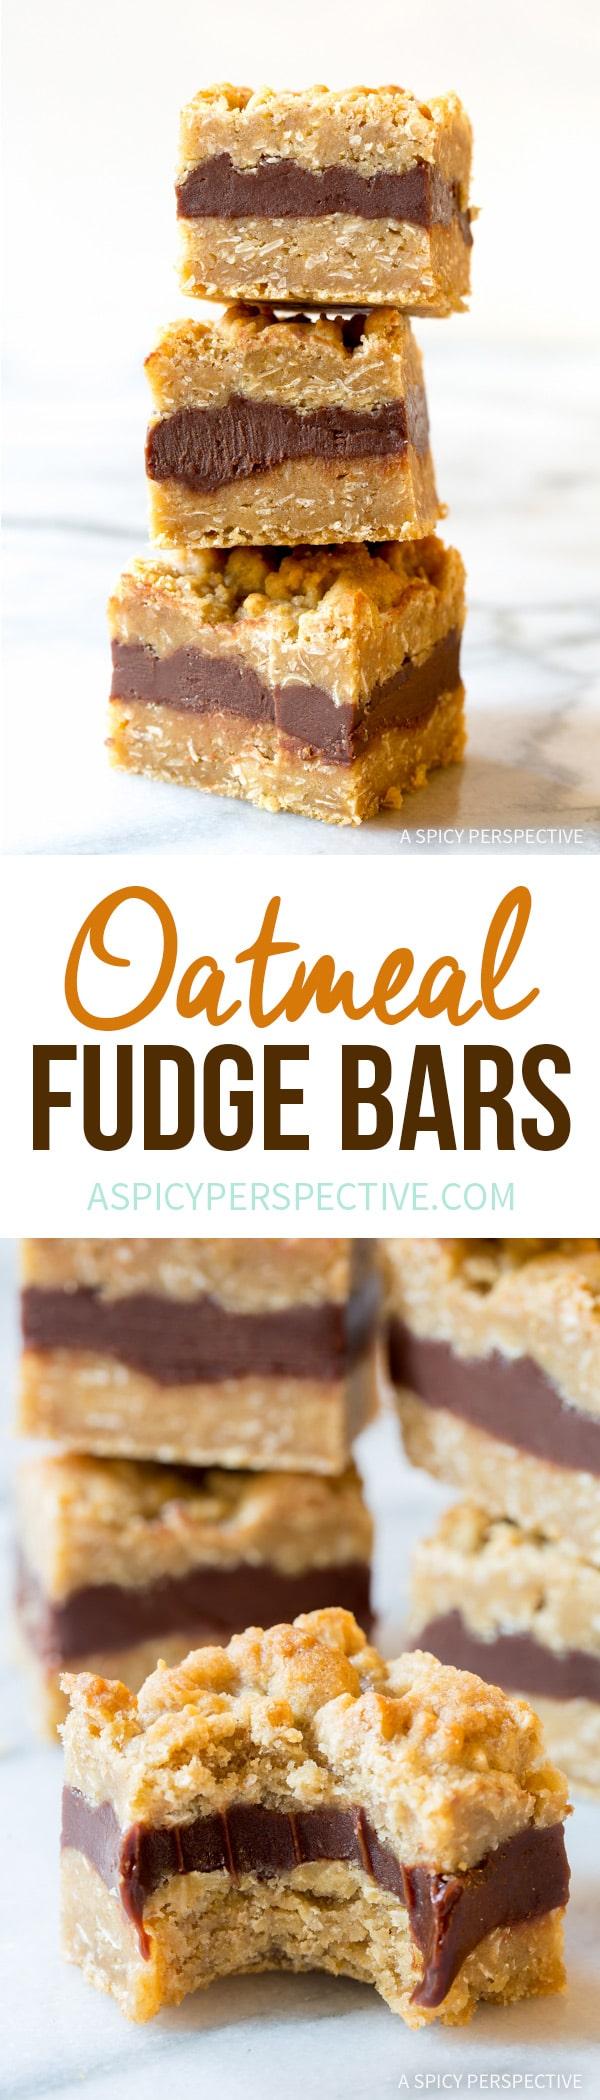 Oatmeal Fudge Bars Recipe | ASpicyPerspective.com